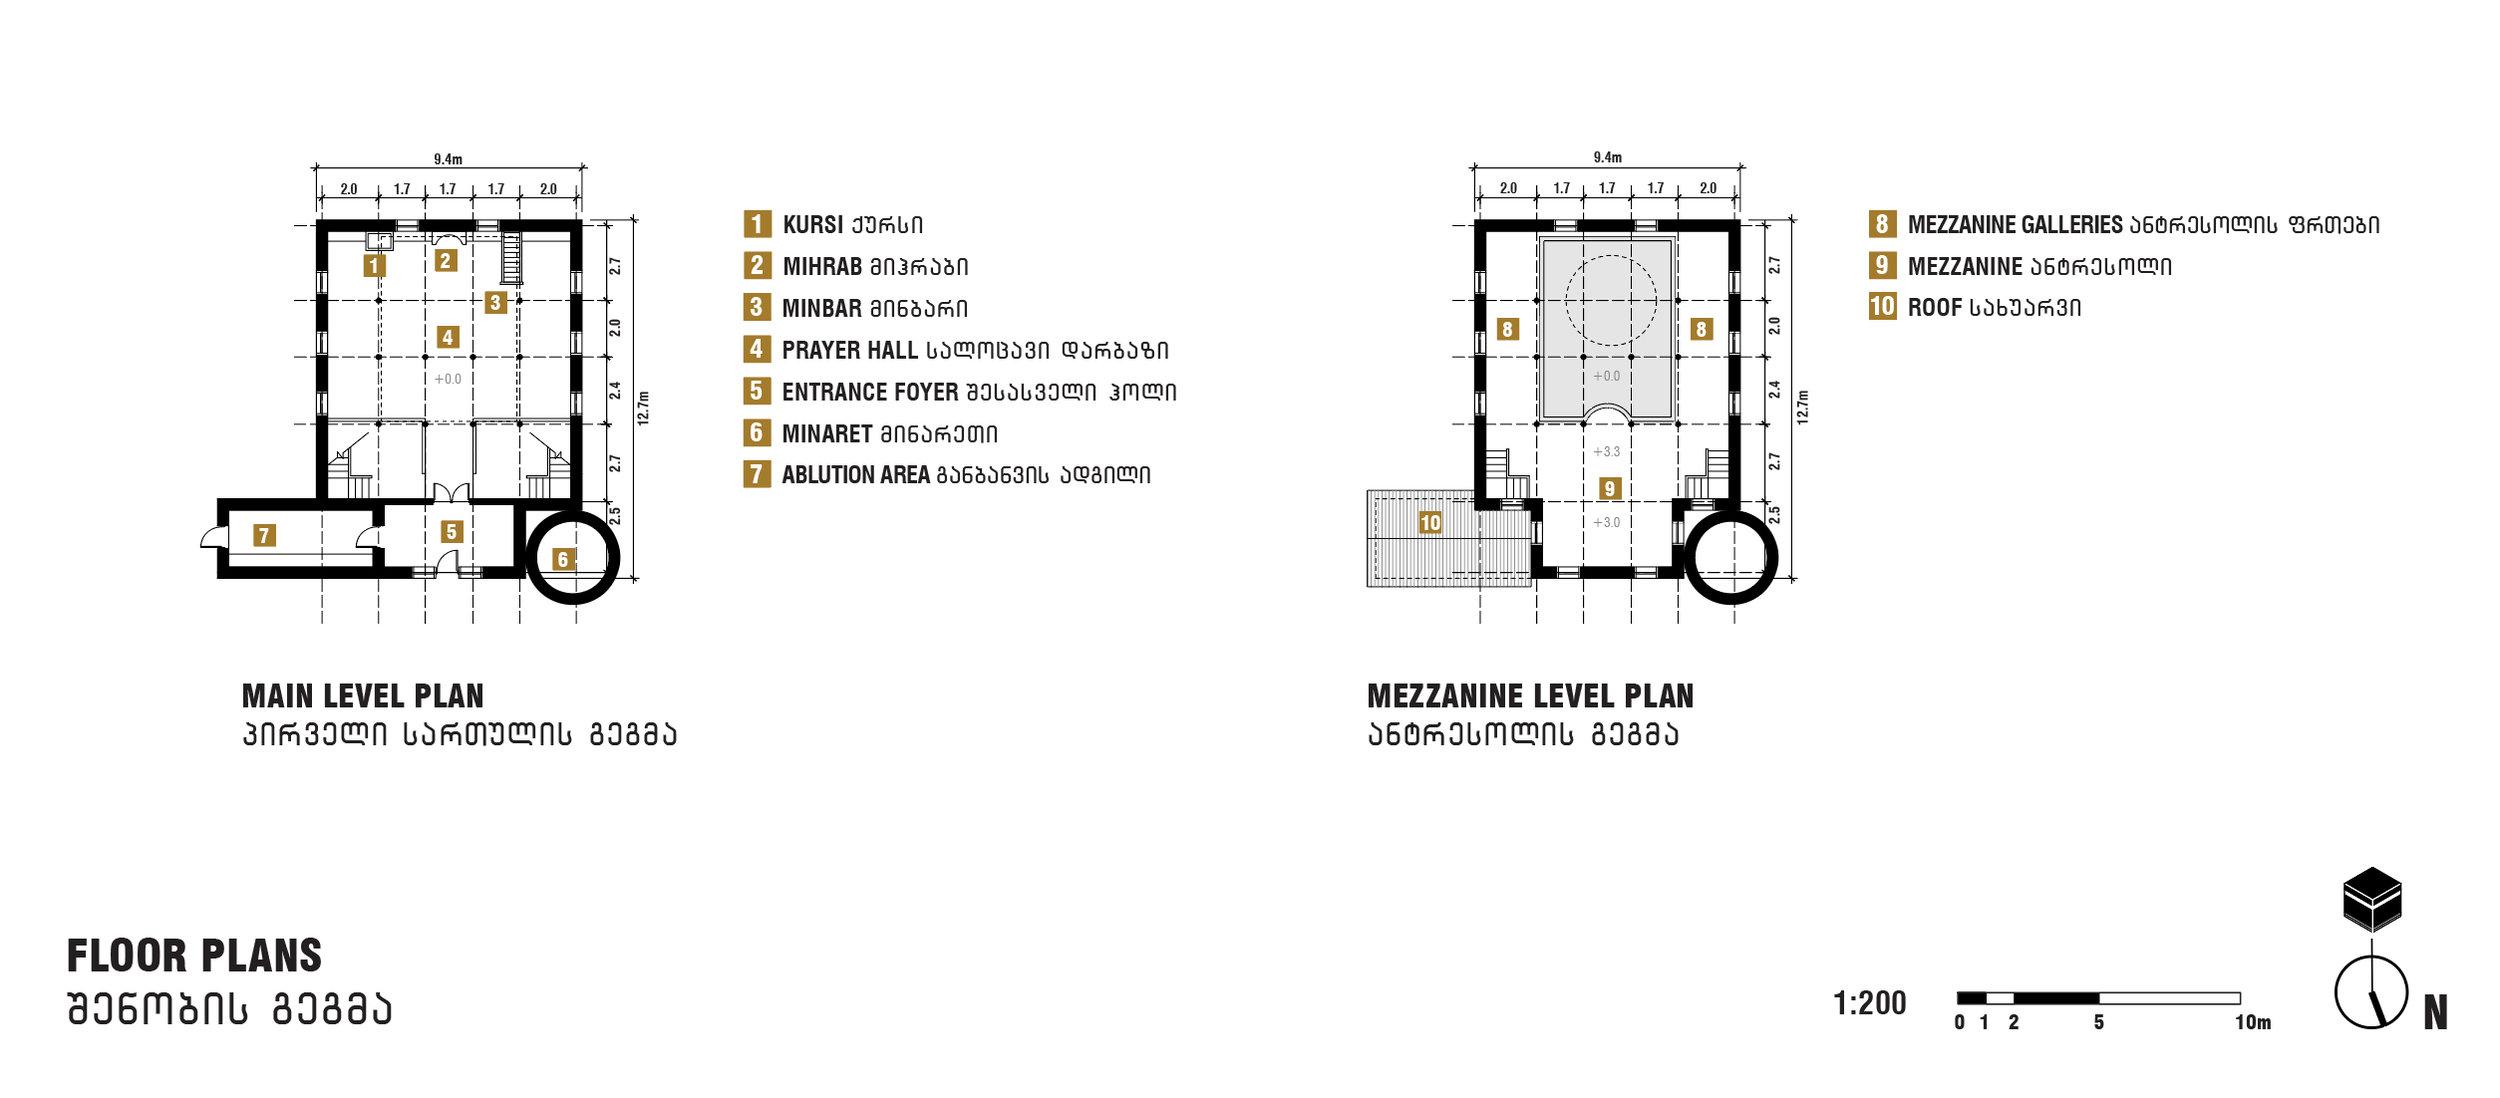 BEGHLETI_Floorplans 1-200 copy.jpg